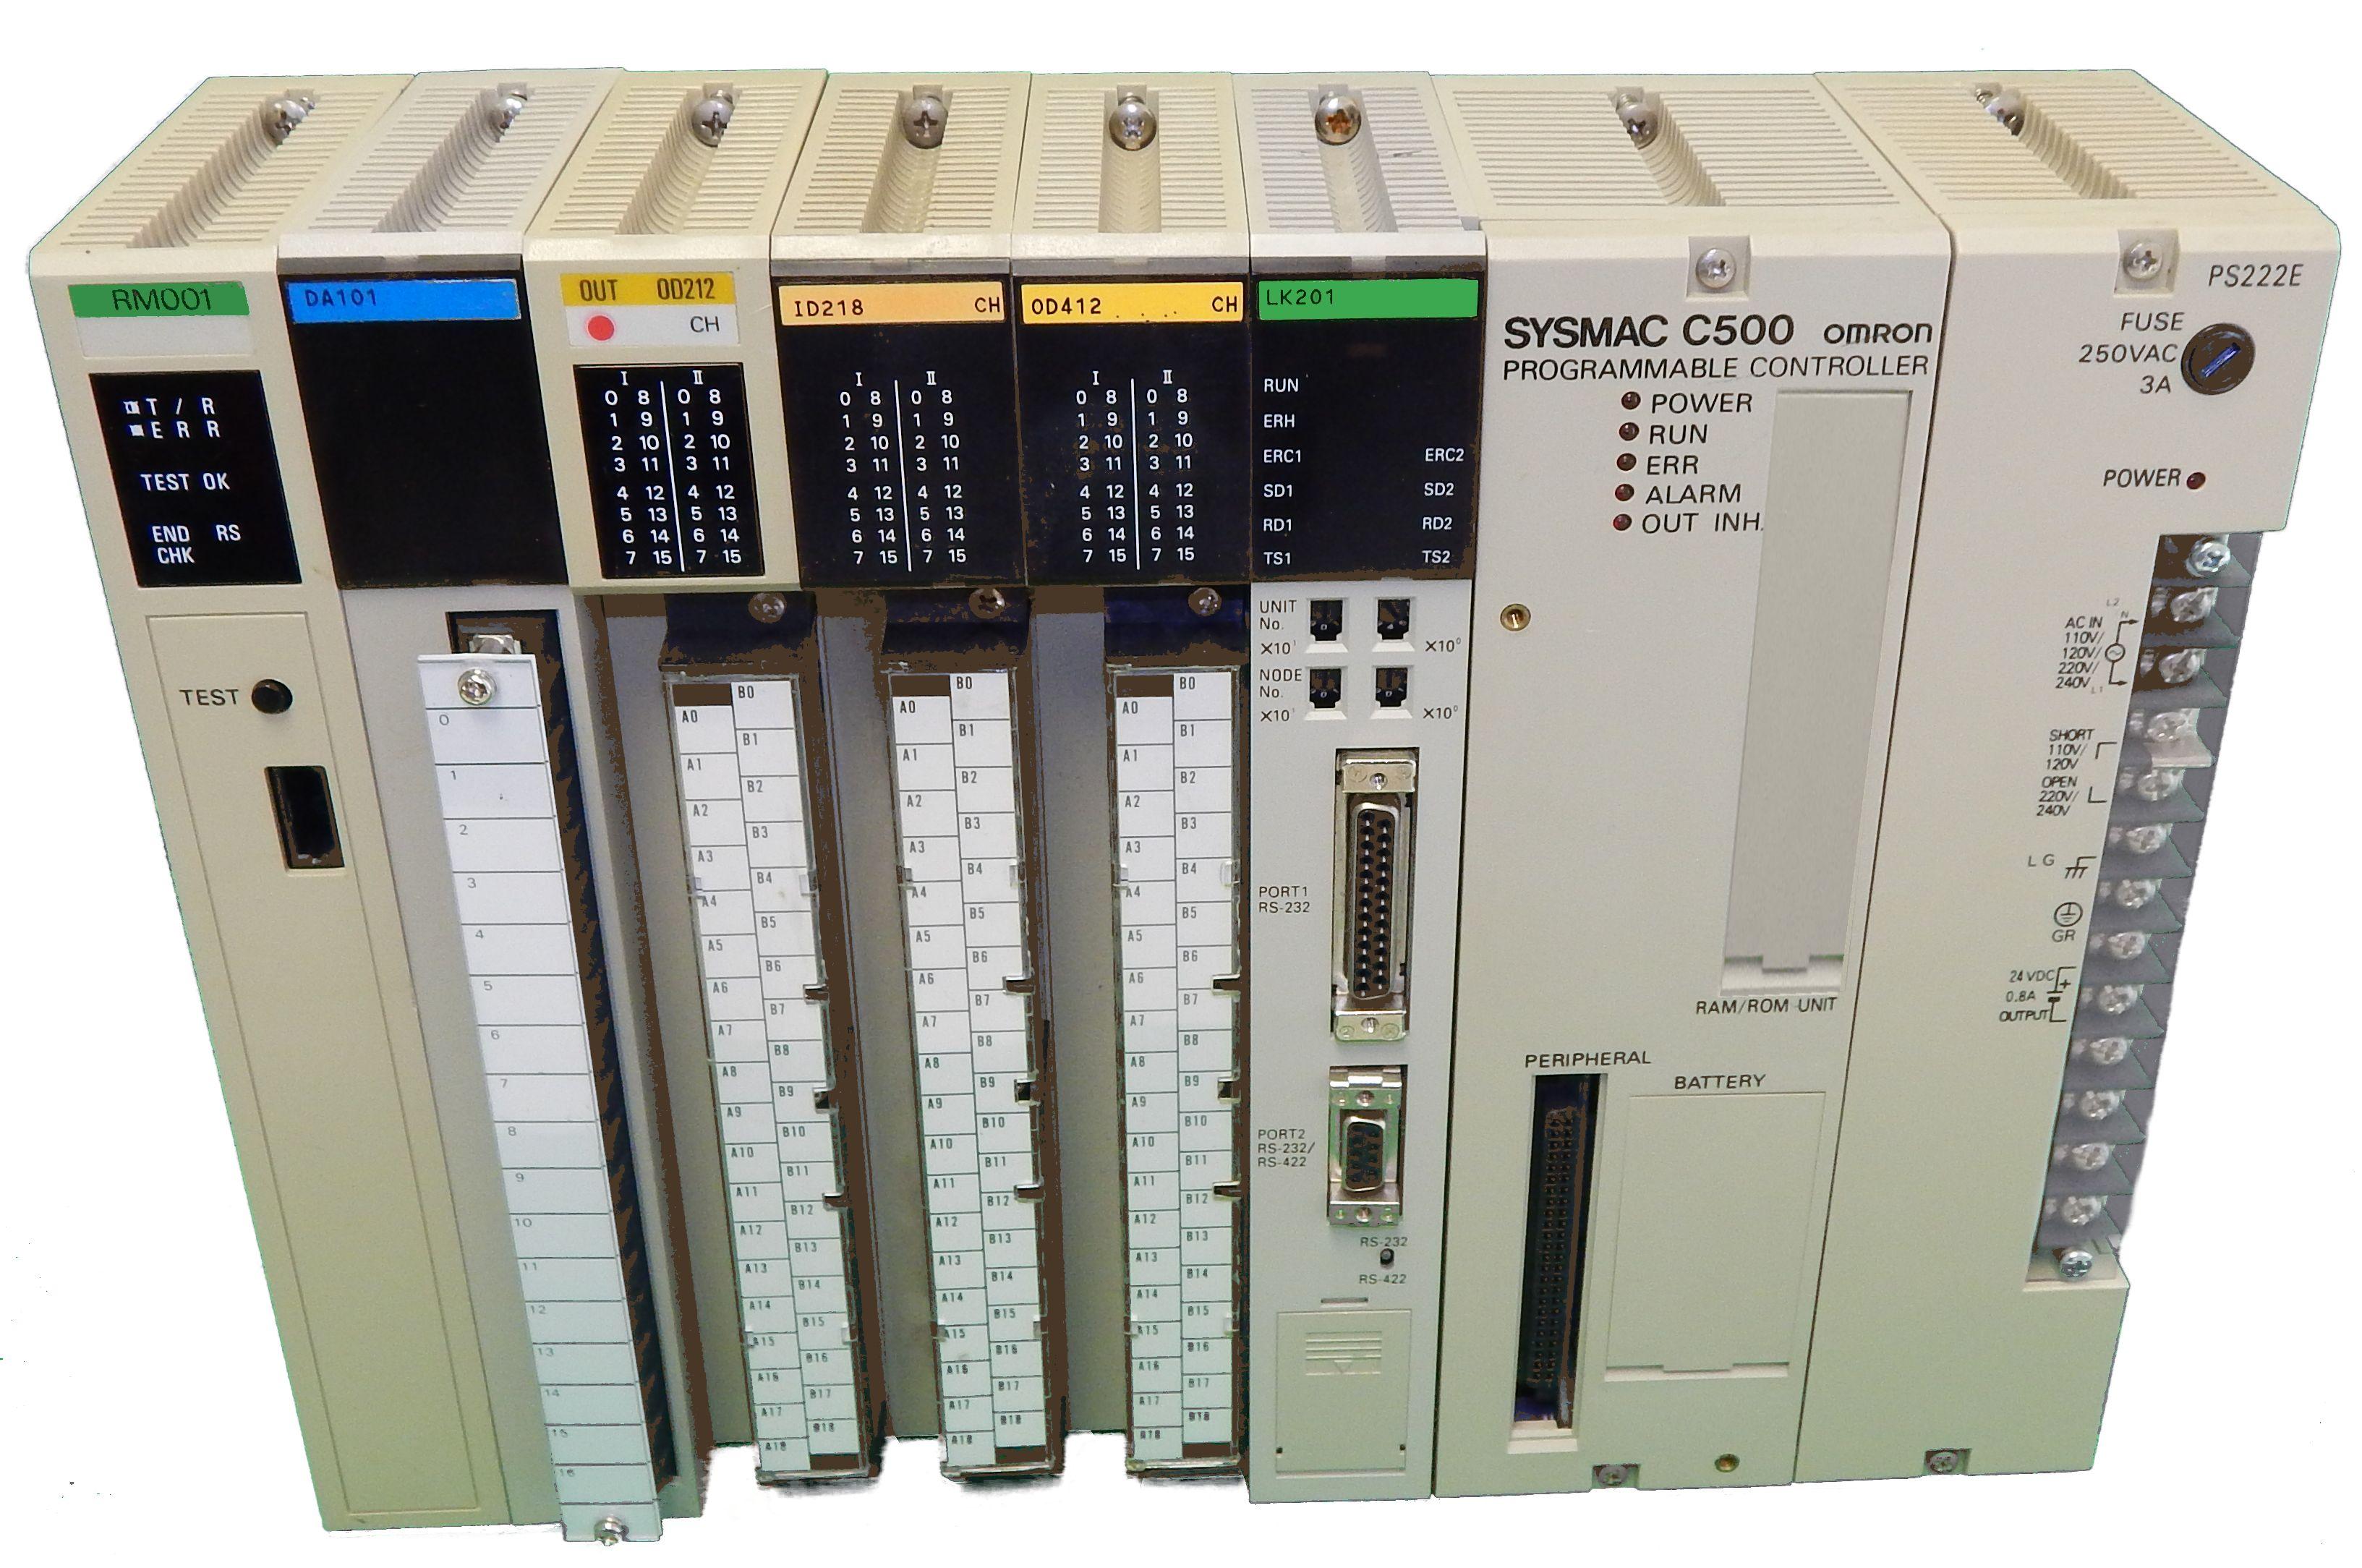 3G2A5-NC101-E